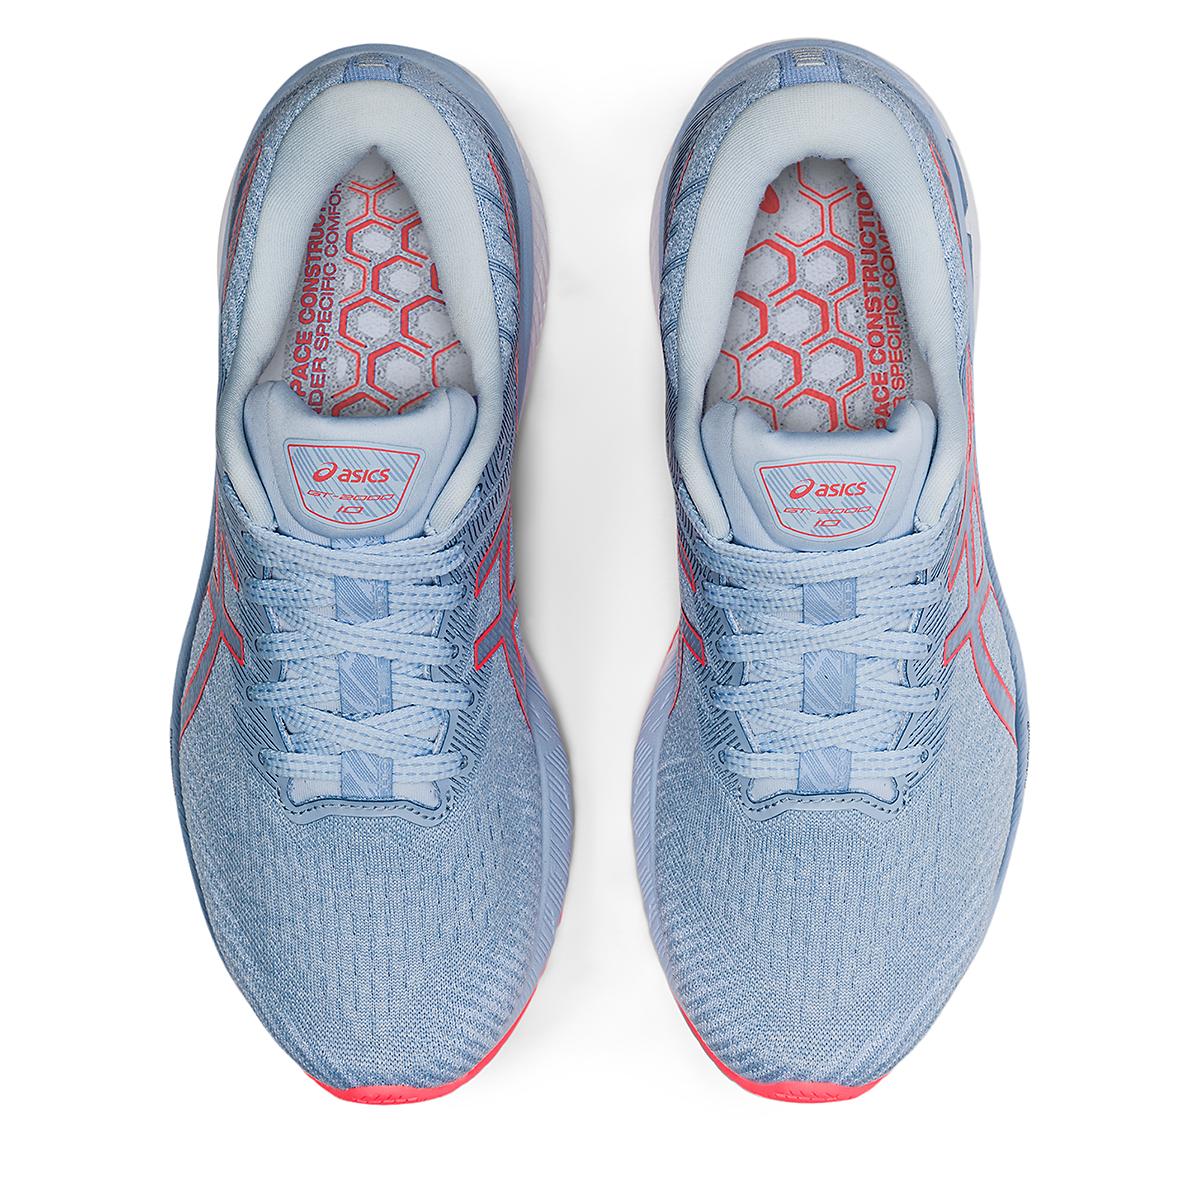 Women's Asics GT-2000 10 Running Shoe - Color: Mist/Blazing Coral - Size: 5 - Width: Regular, Mist/Blazing Coral, large, image 6